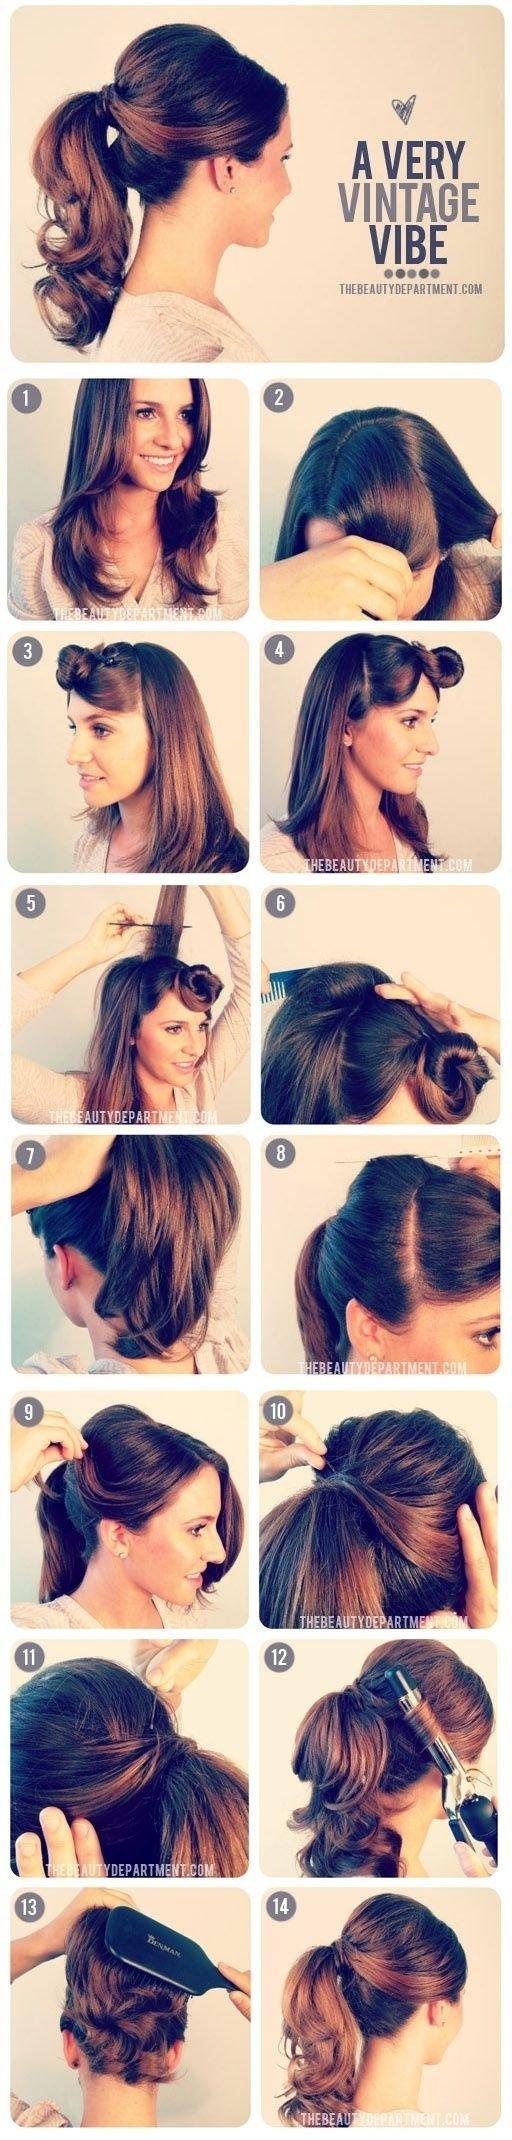 hair, hairstyle, forehead, long hair, hair coloring,